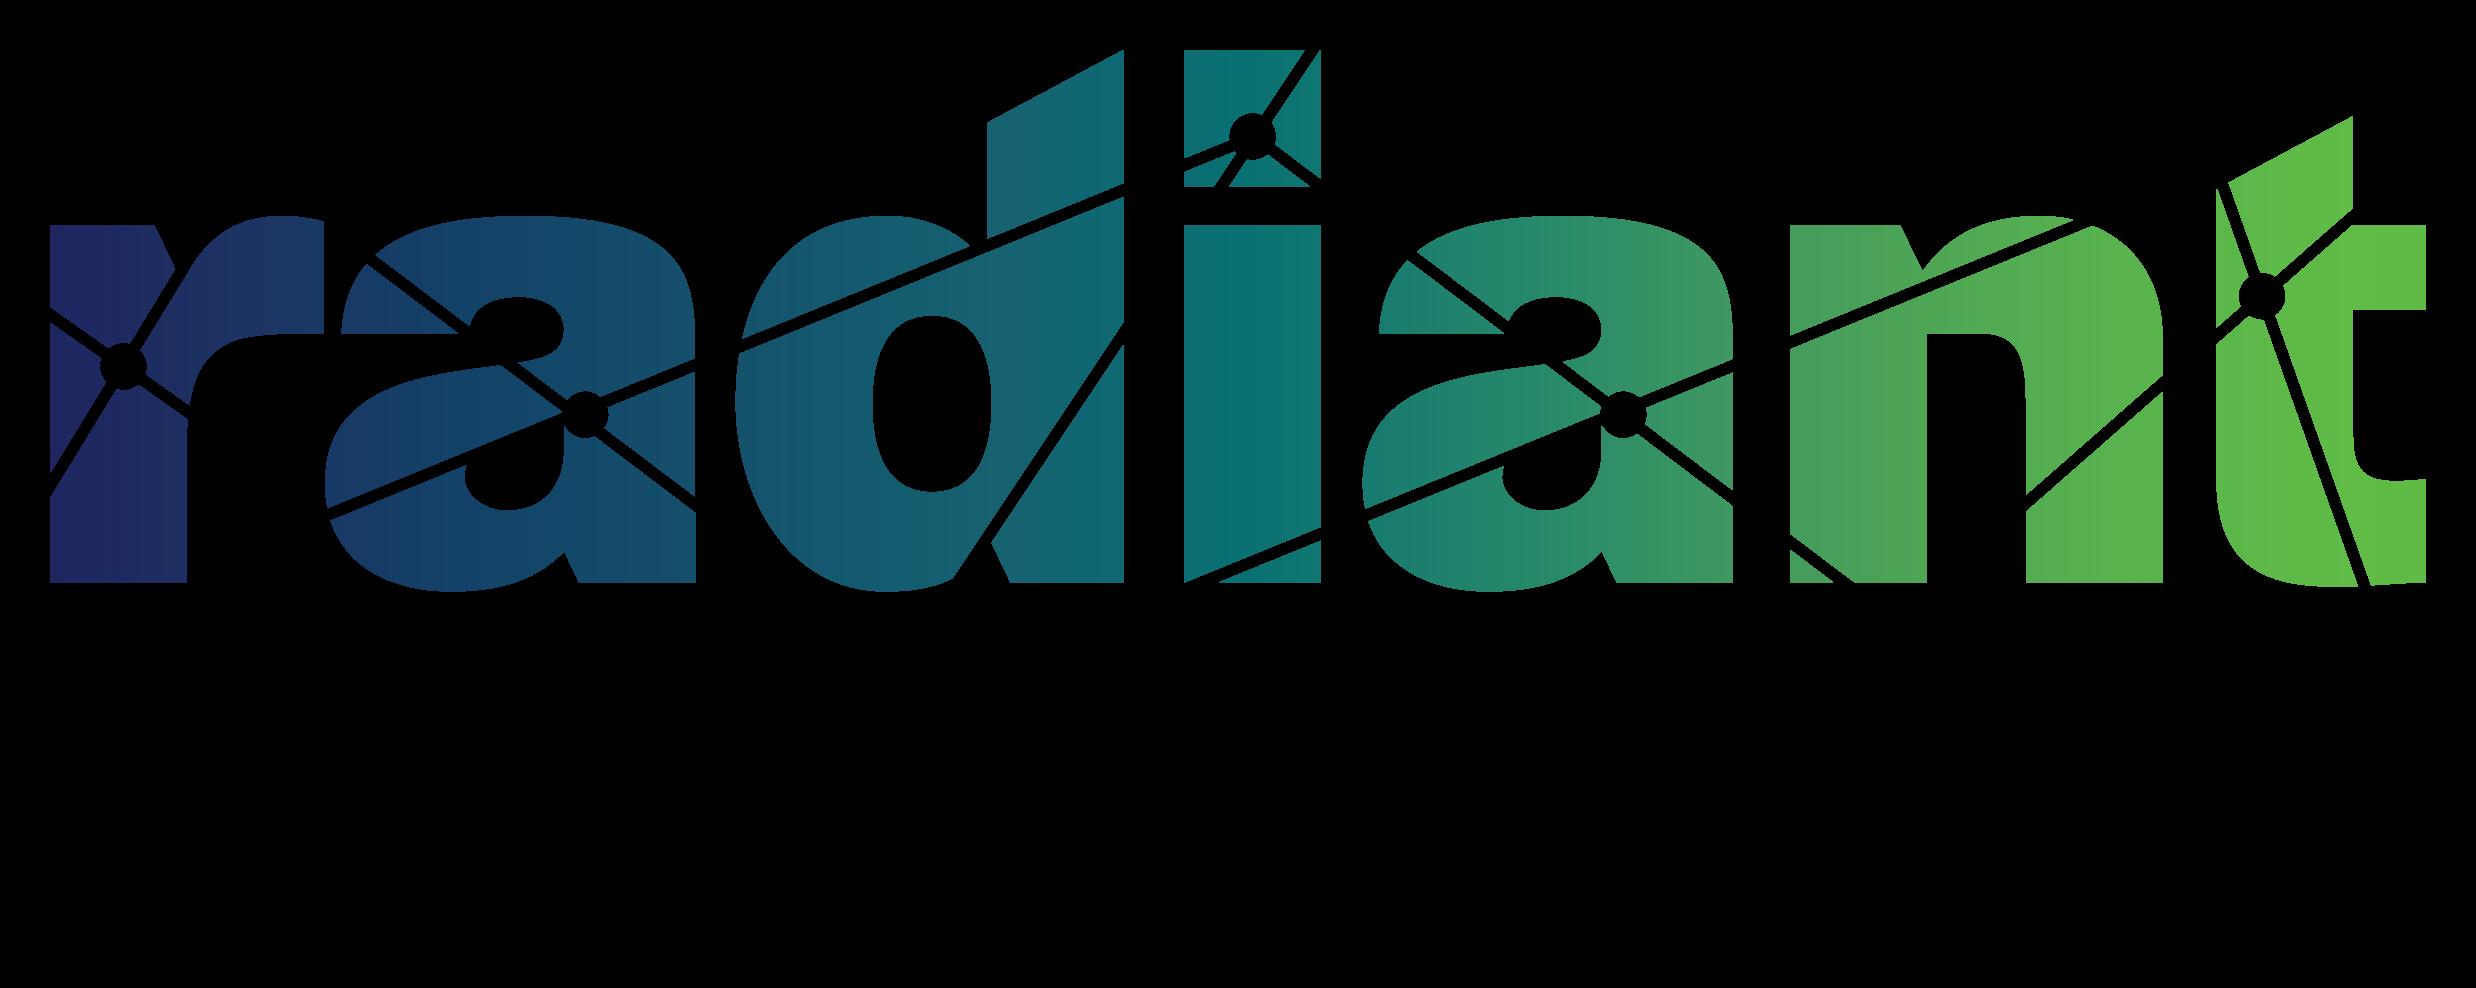 Radiant-Solutions-Logo-Transparent-11-3-